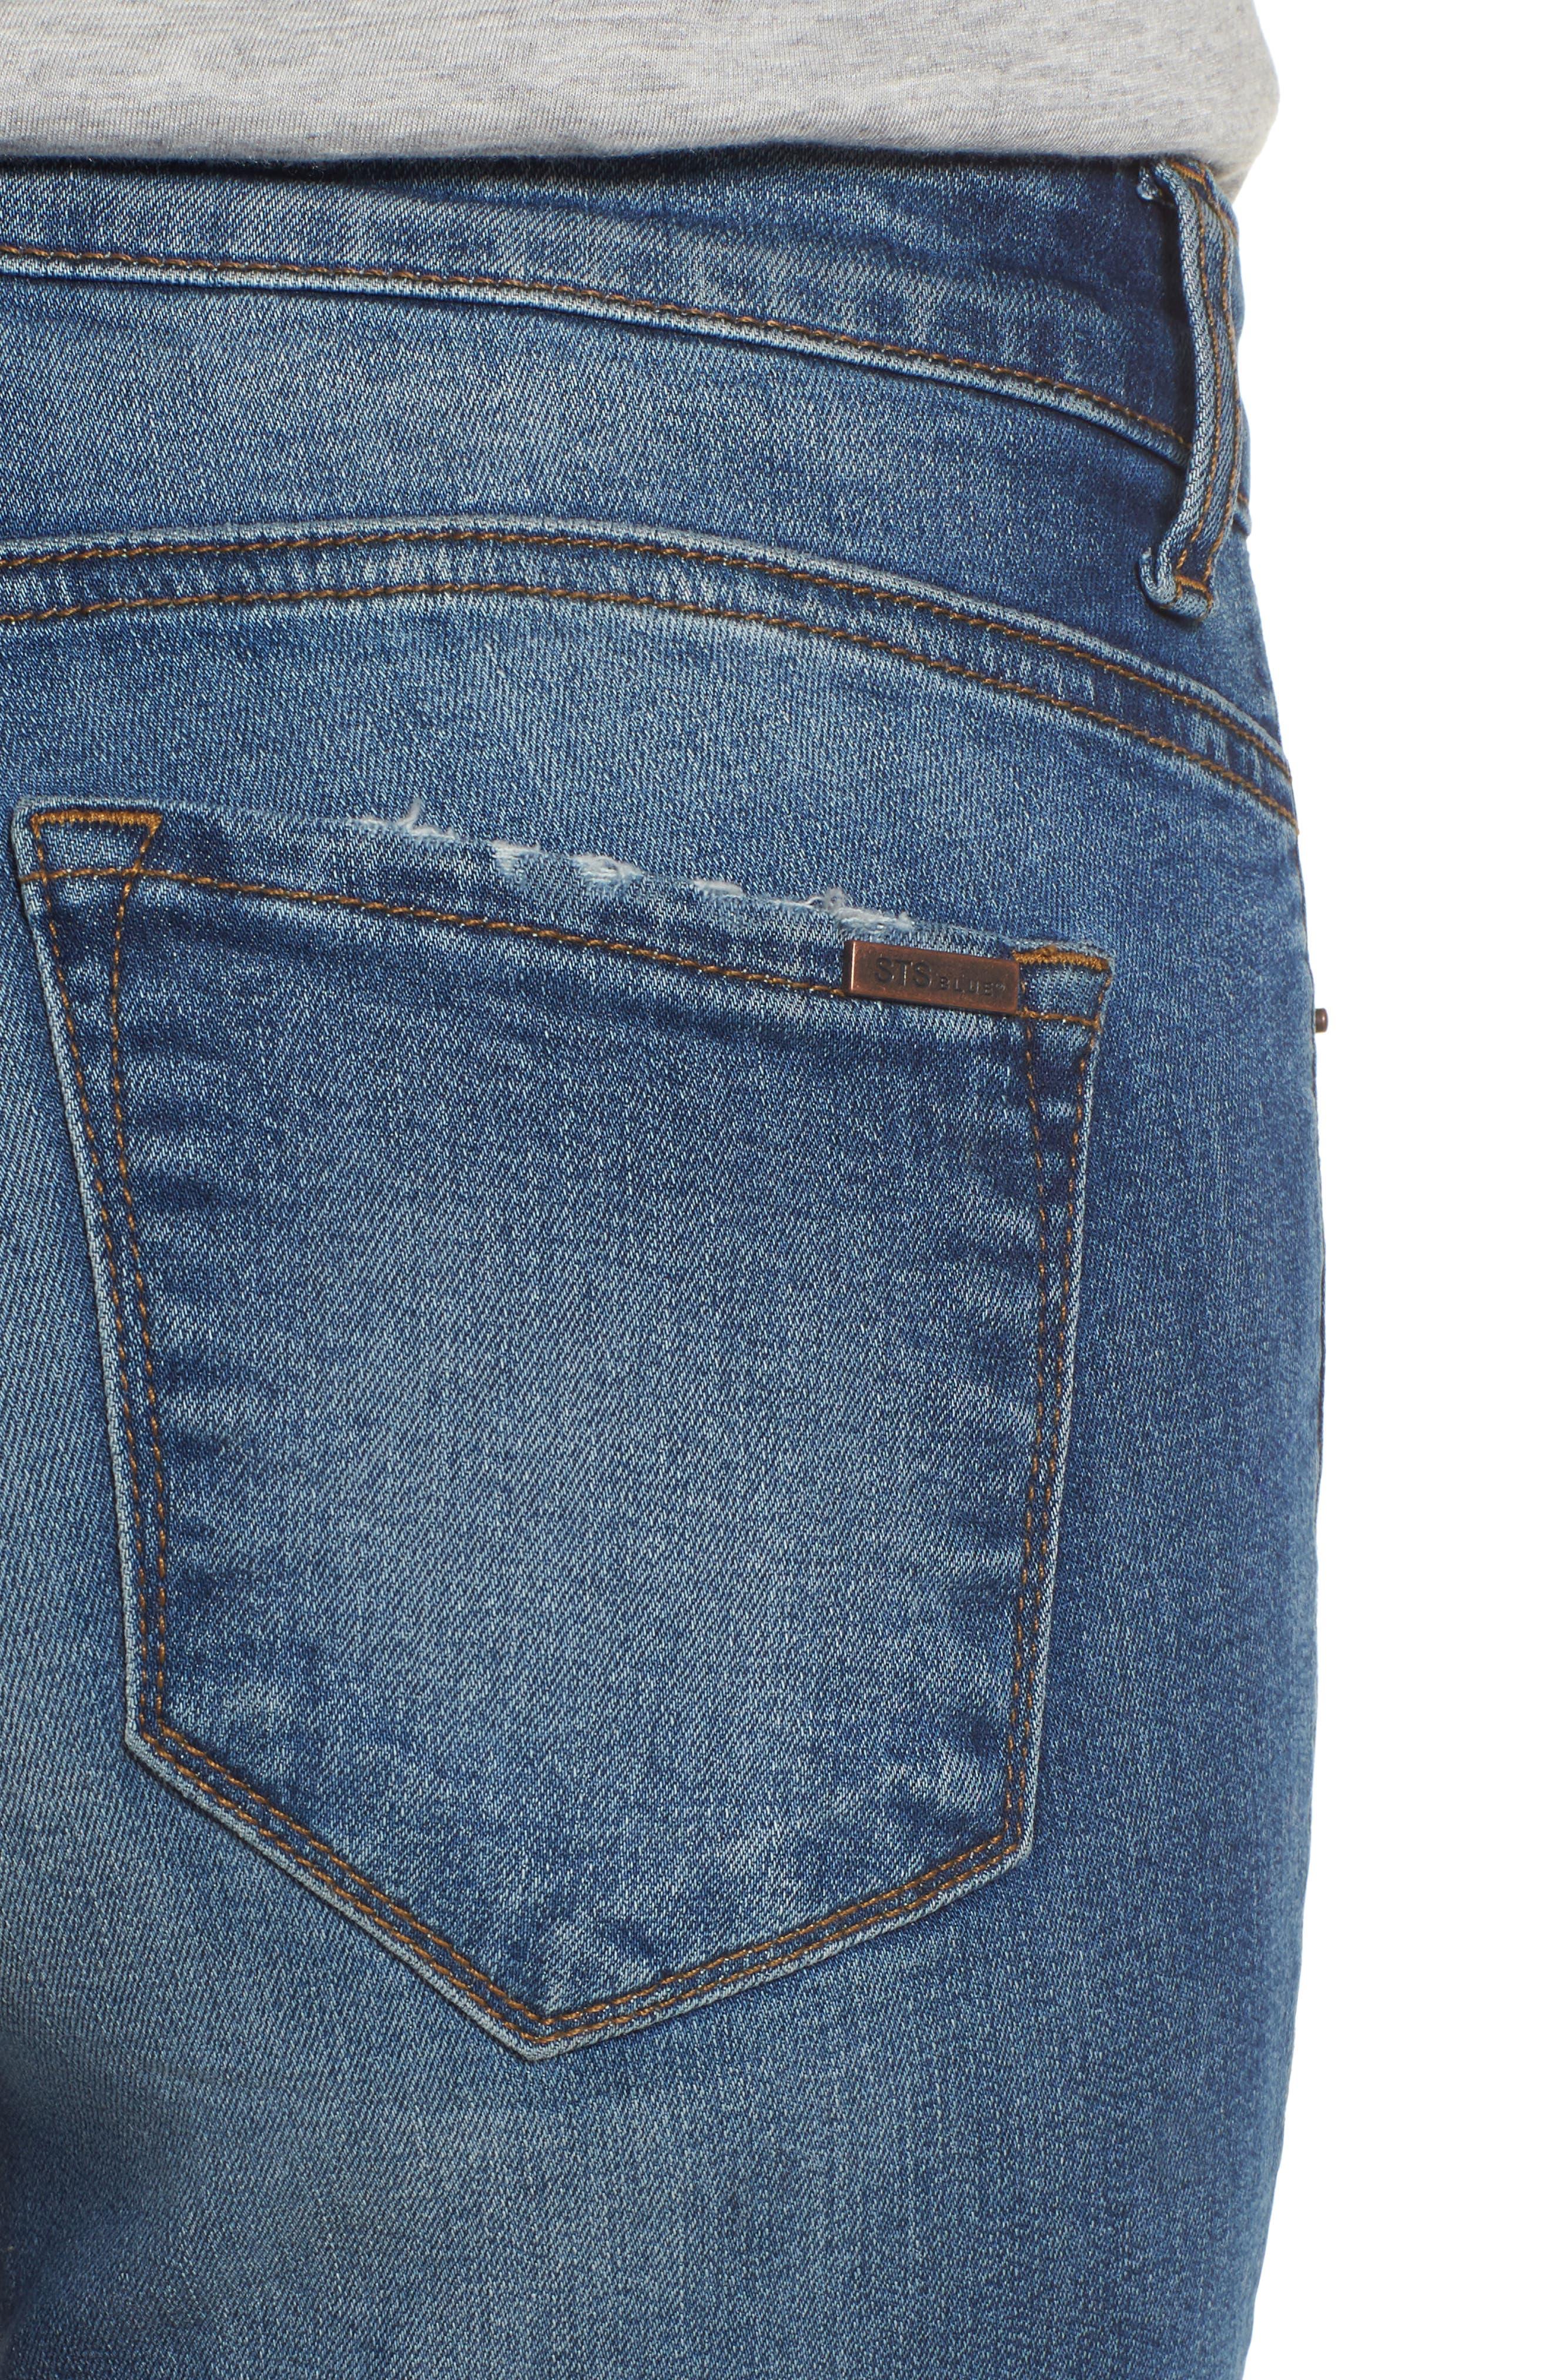 Cuffed Bermuda Denim Shorts,                             Alternate thumbnail 4, color,                             Lilac W/ Med Base